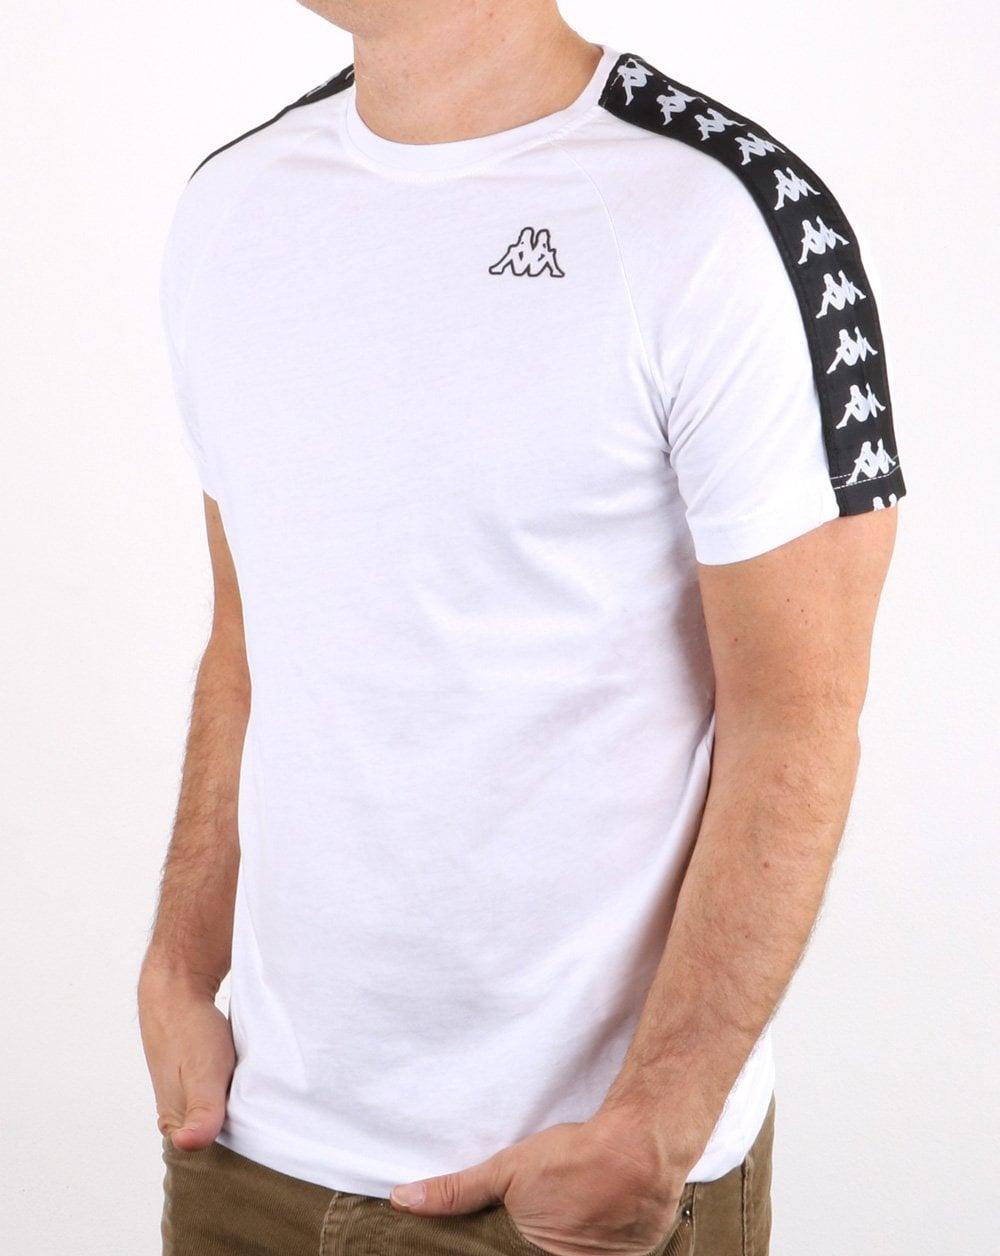 low priced 29389 1b33a Kappa Banda Coen T-shirt White/Black